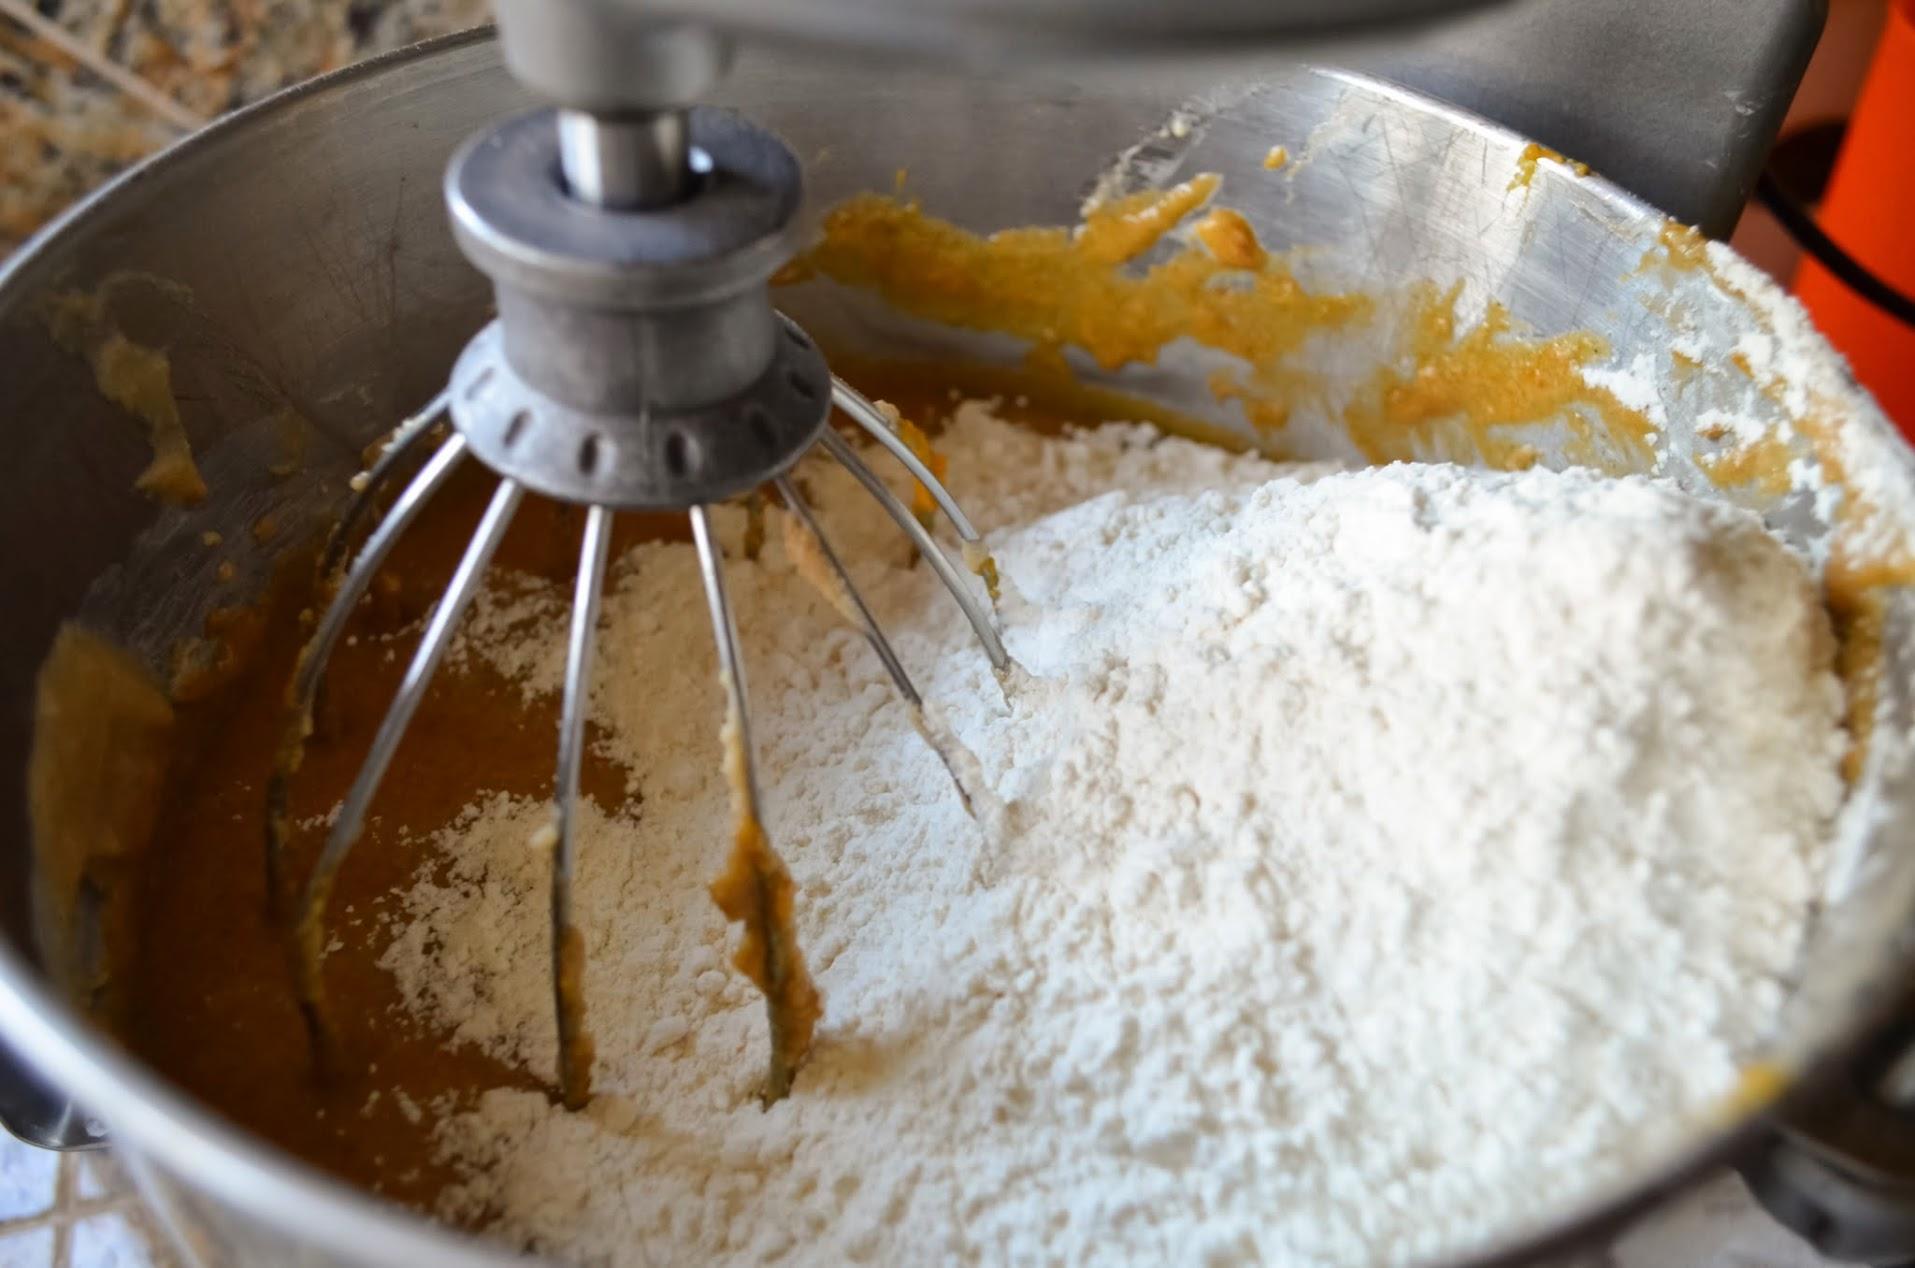 Pumpkin-Spice-Bundt-Cake-With-Caramel-Icing-Flour.jpg